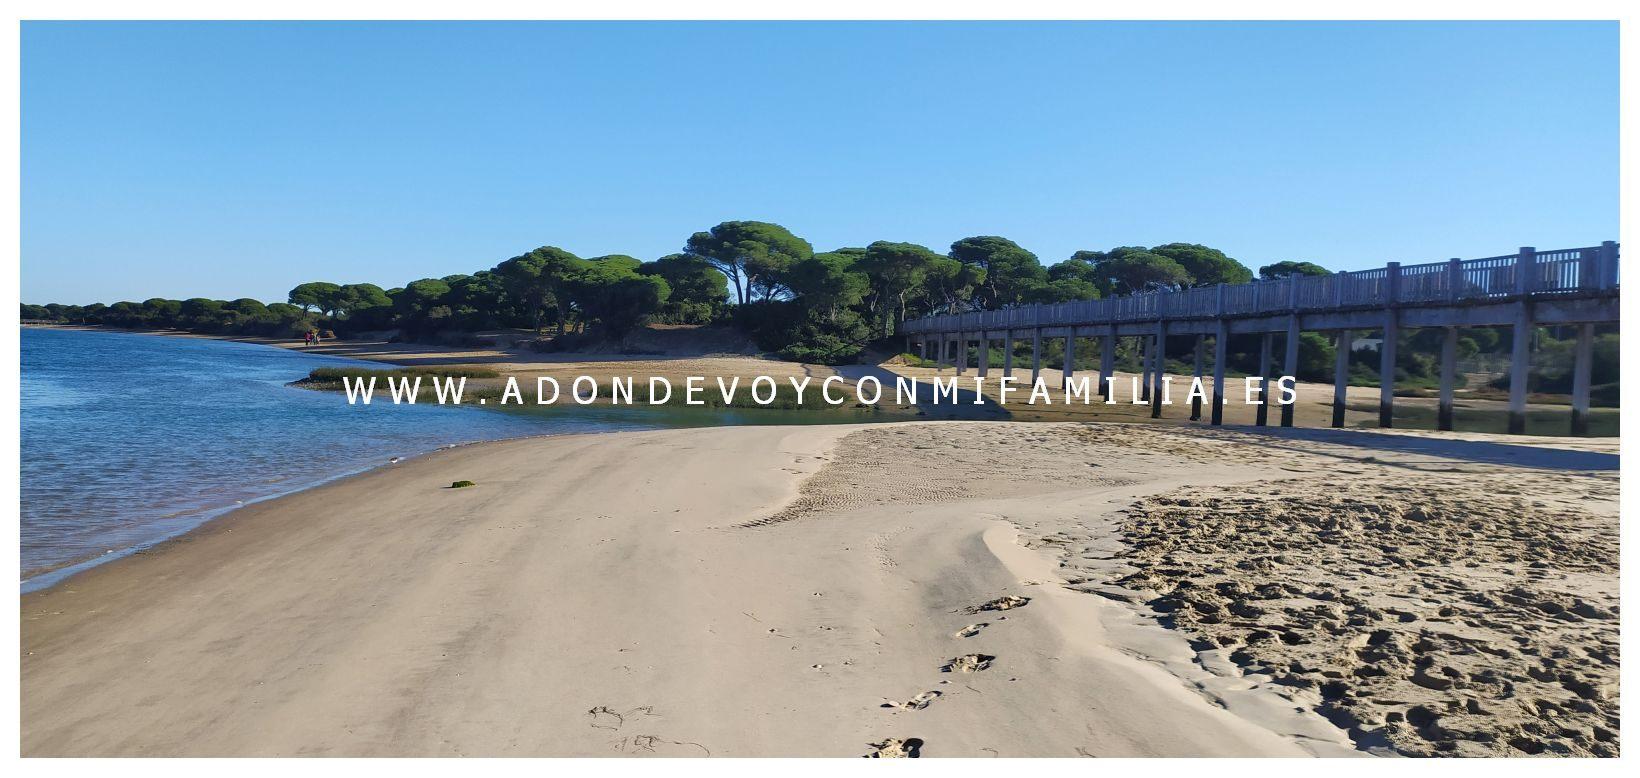 playa-rio-san-pedro-Adondevoyconmifamilia-04